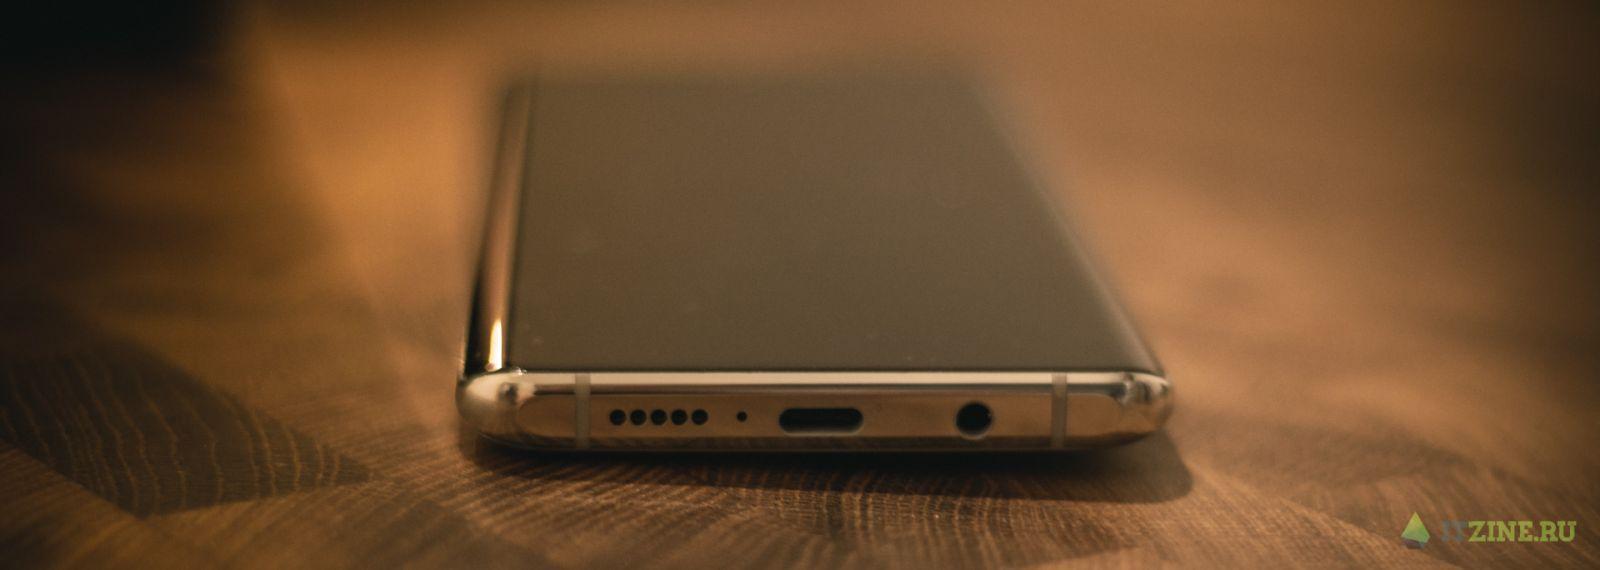 Обзор Xiaomi Mi Note 10 Pro. Добротный флагман (dsc 8086)